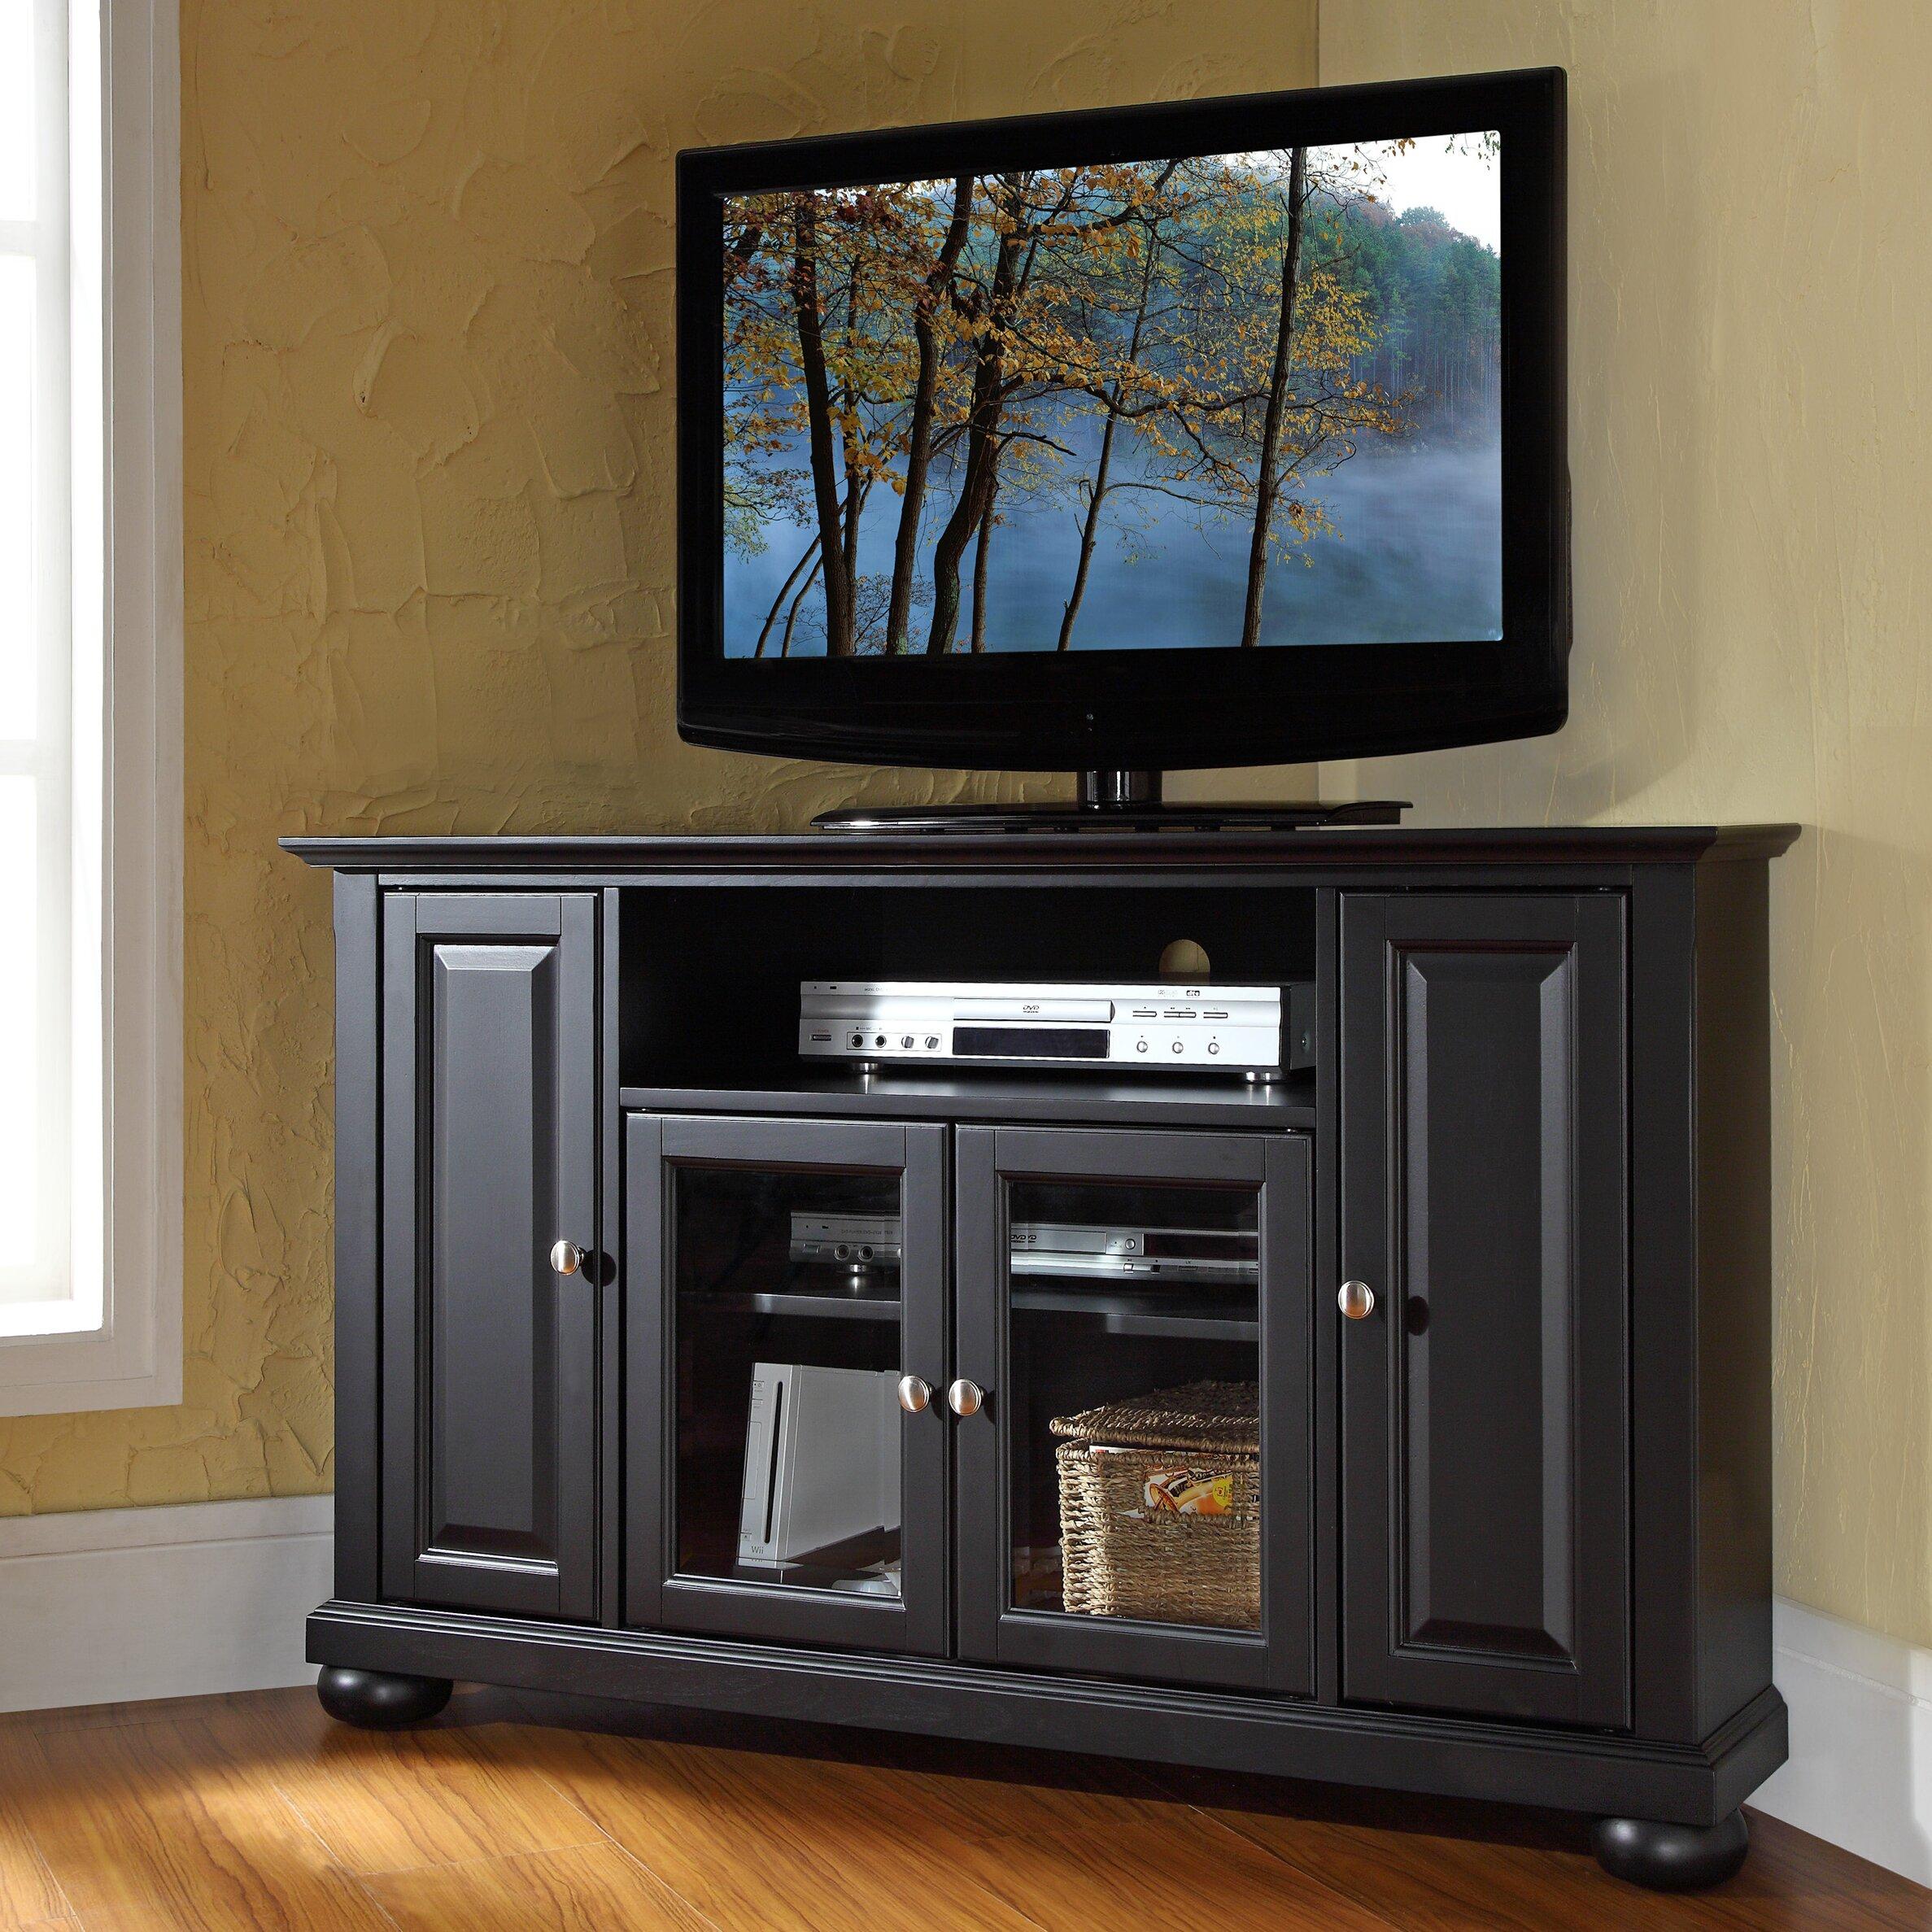 Tv Tables Hernan Tv Unit: Darby Home Co Elvaston Corner TV Stand & Reviews